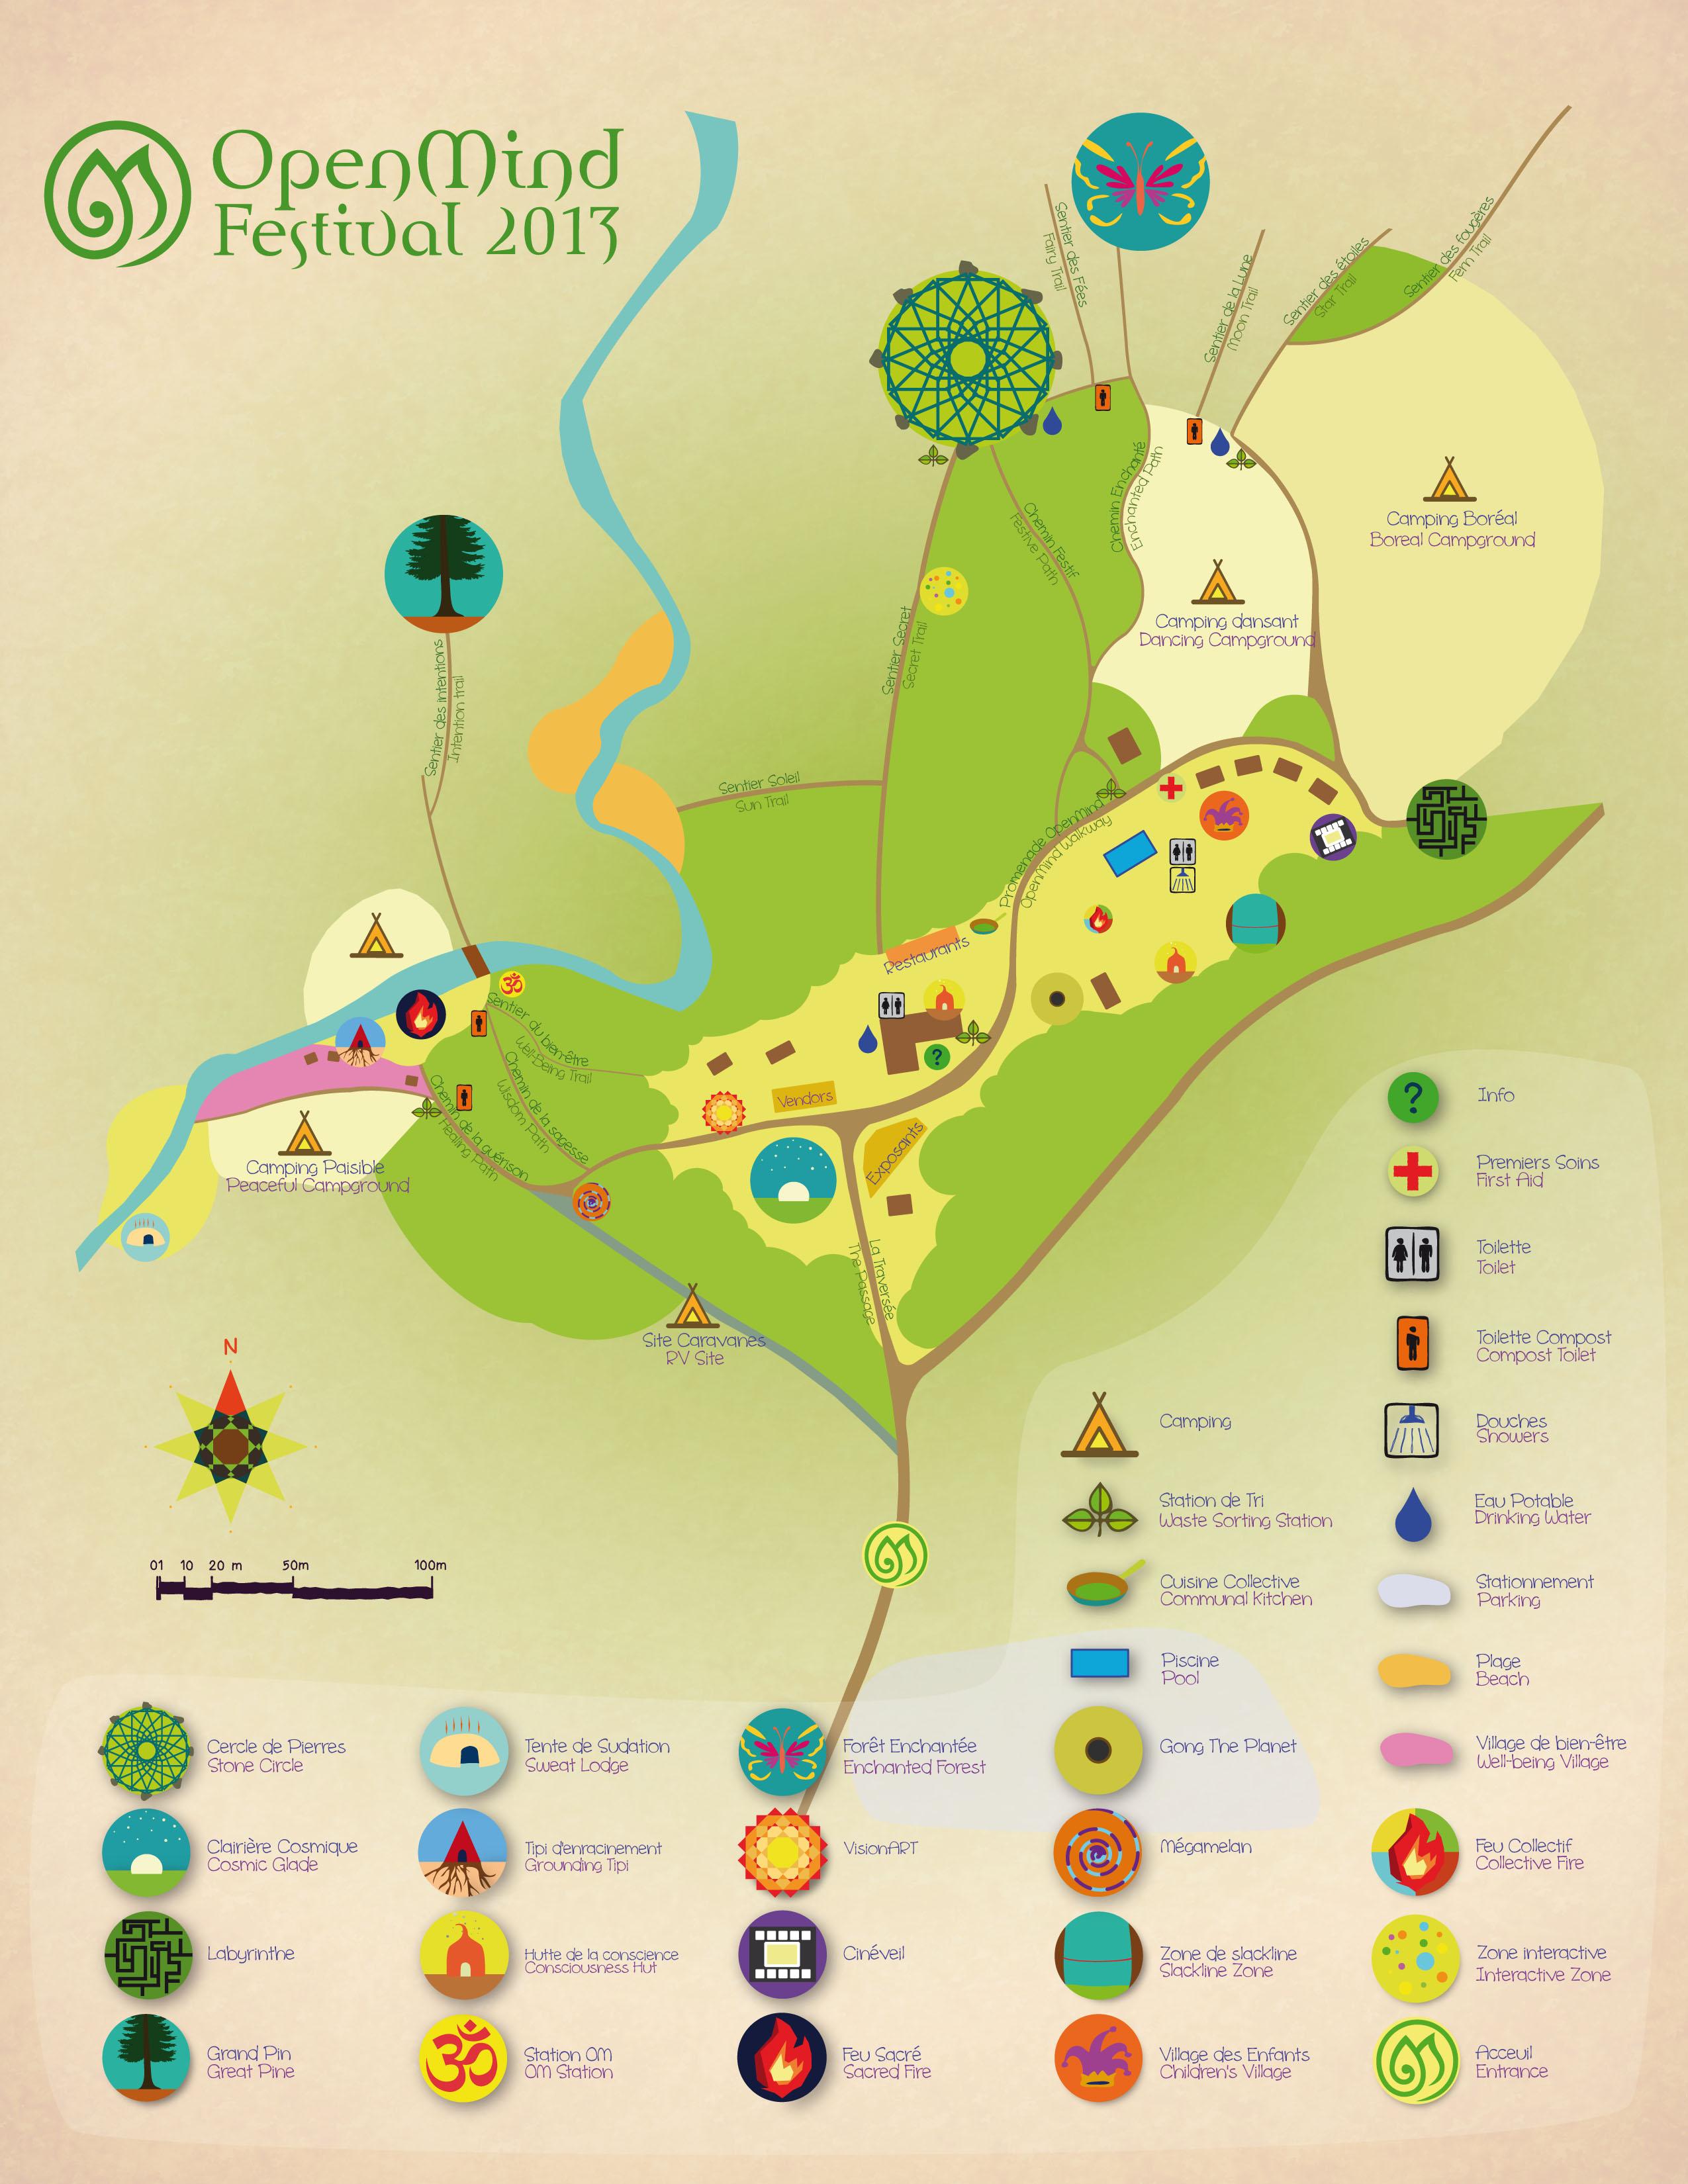 Open Mind Festival Site Map 2013